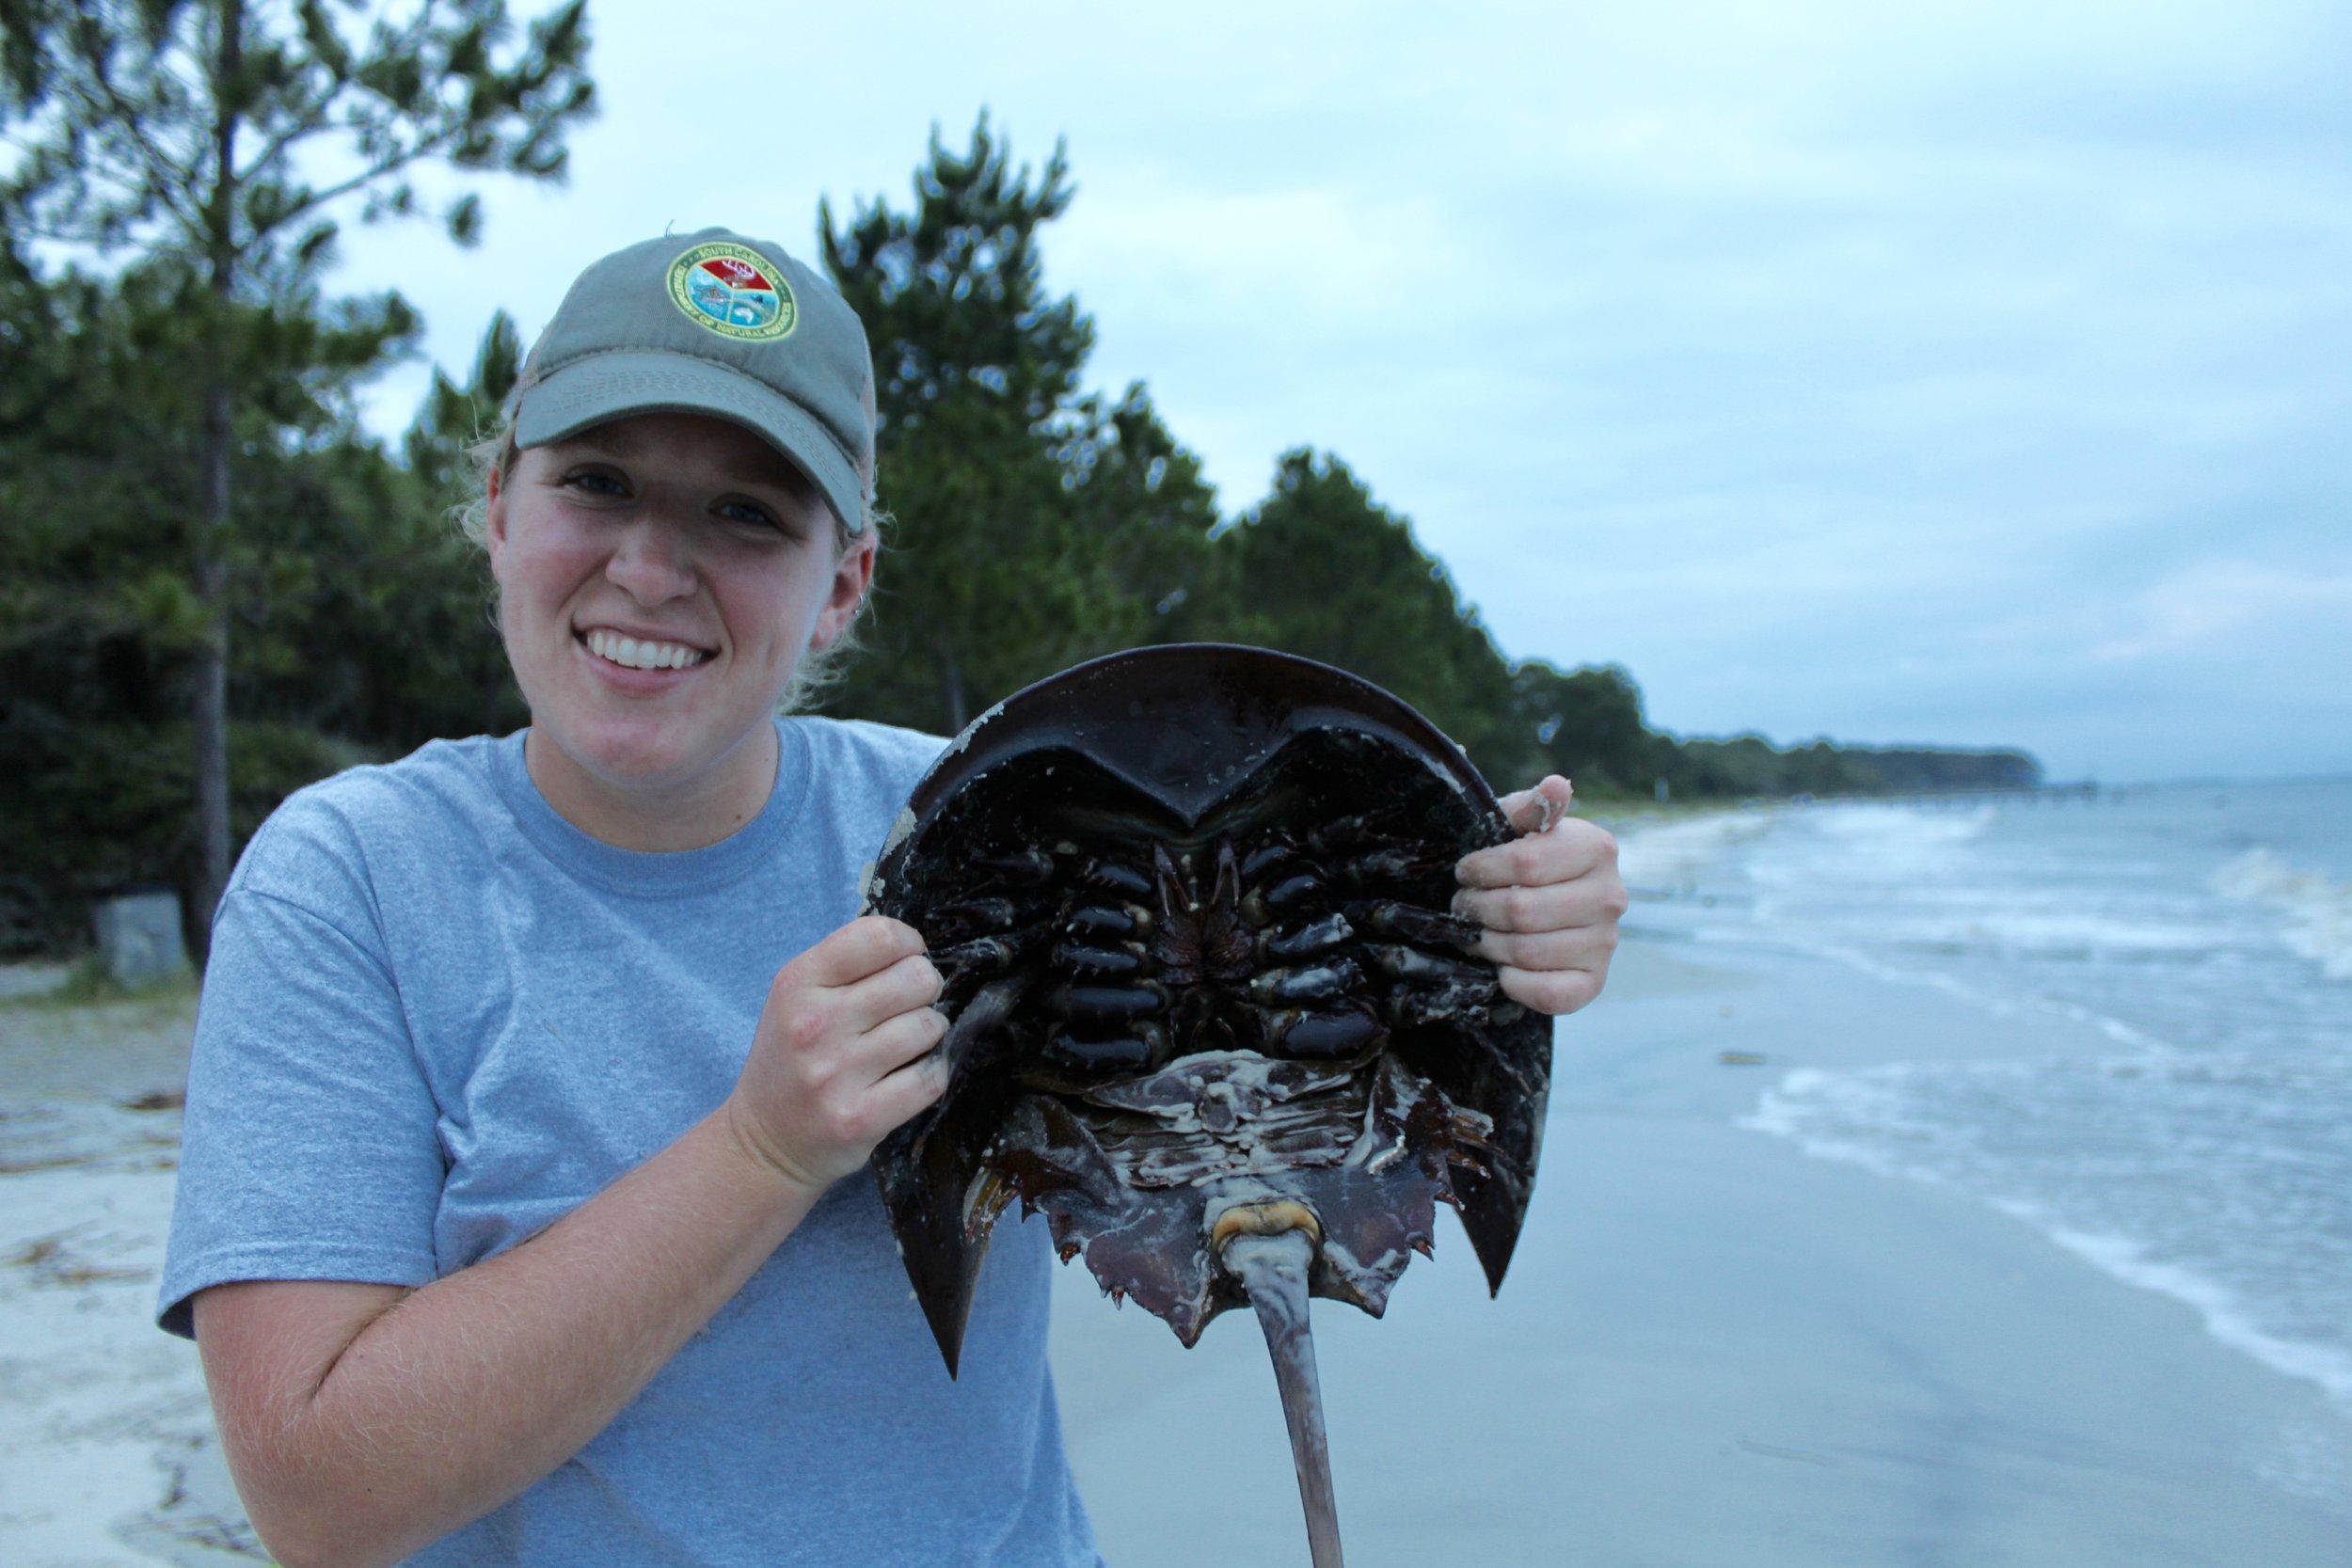 Former SCDNR marine educator Emily Foy holds a horseshoe crab before a 2016 survey. (Photo: E. Weeks/SCDNR)